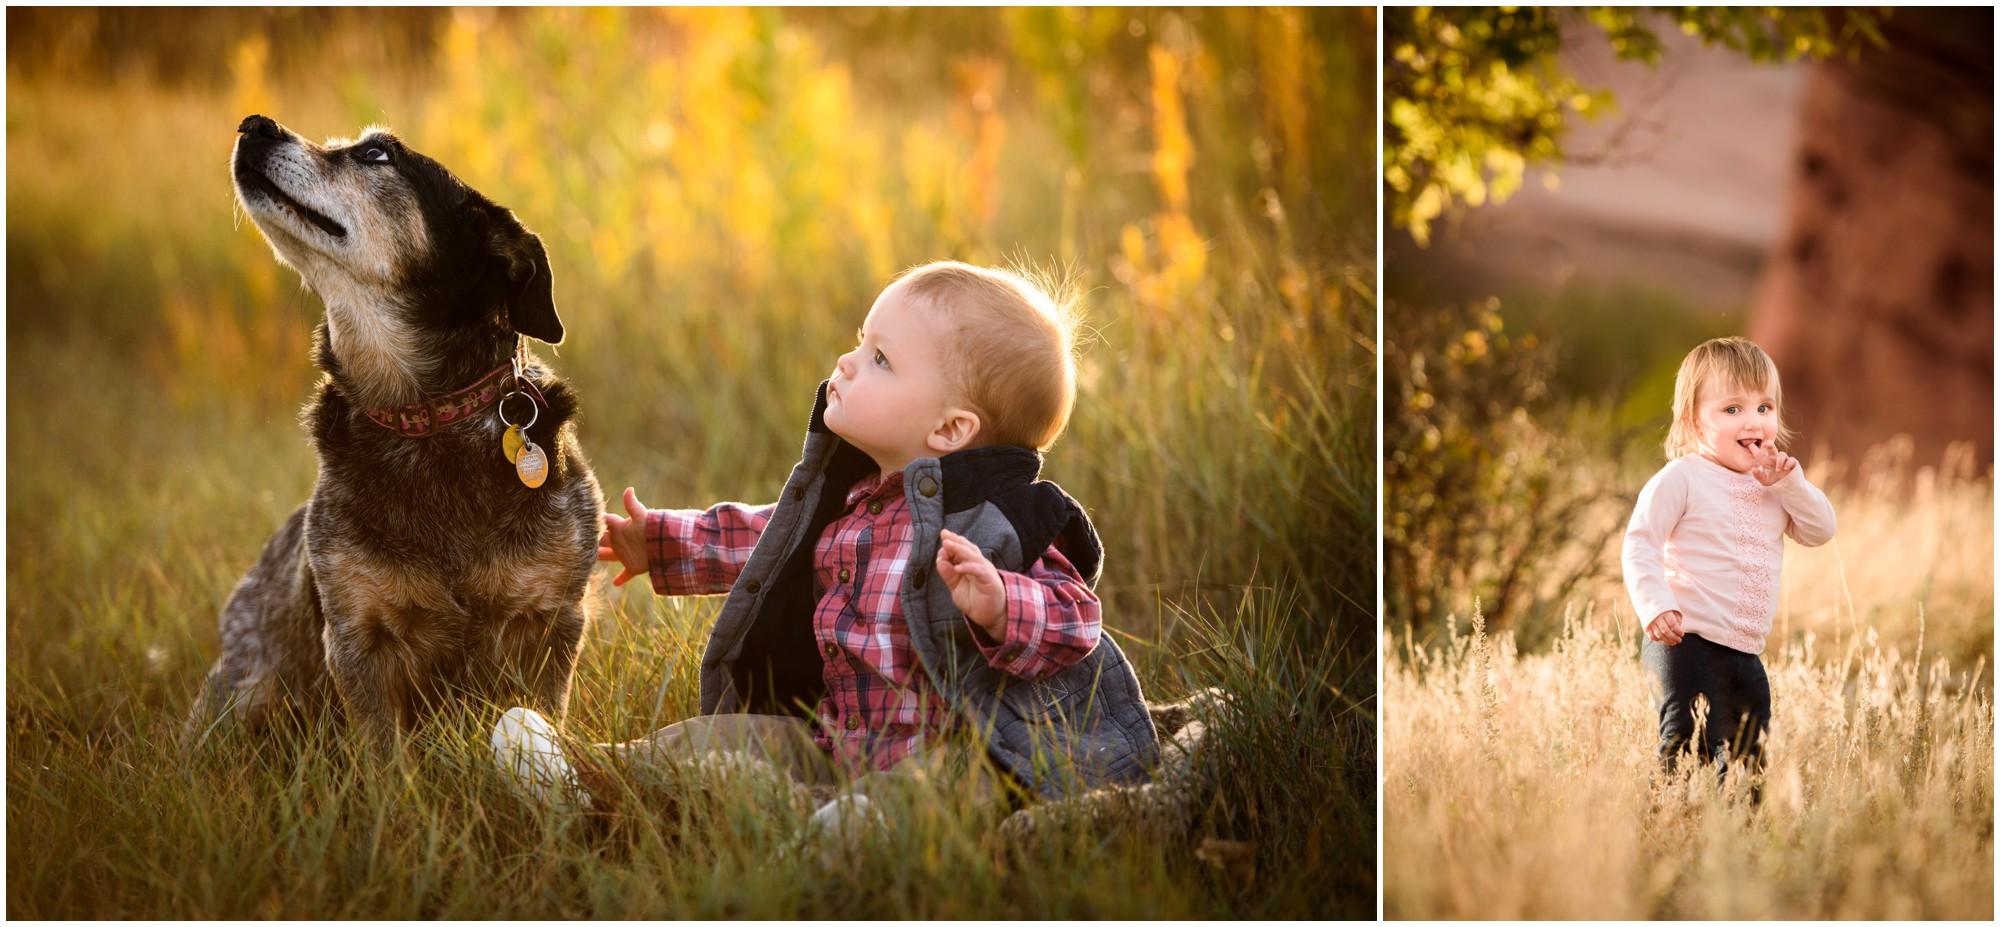 98-northglenn-family-fall-photography.jpg